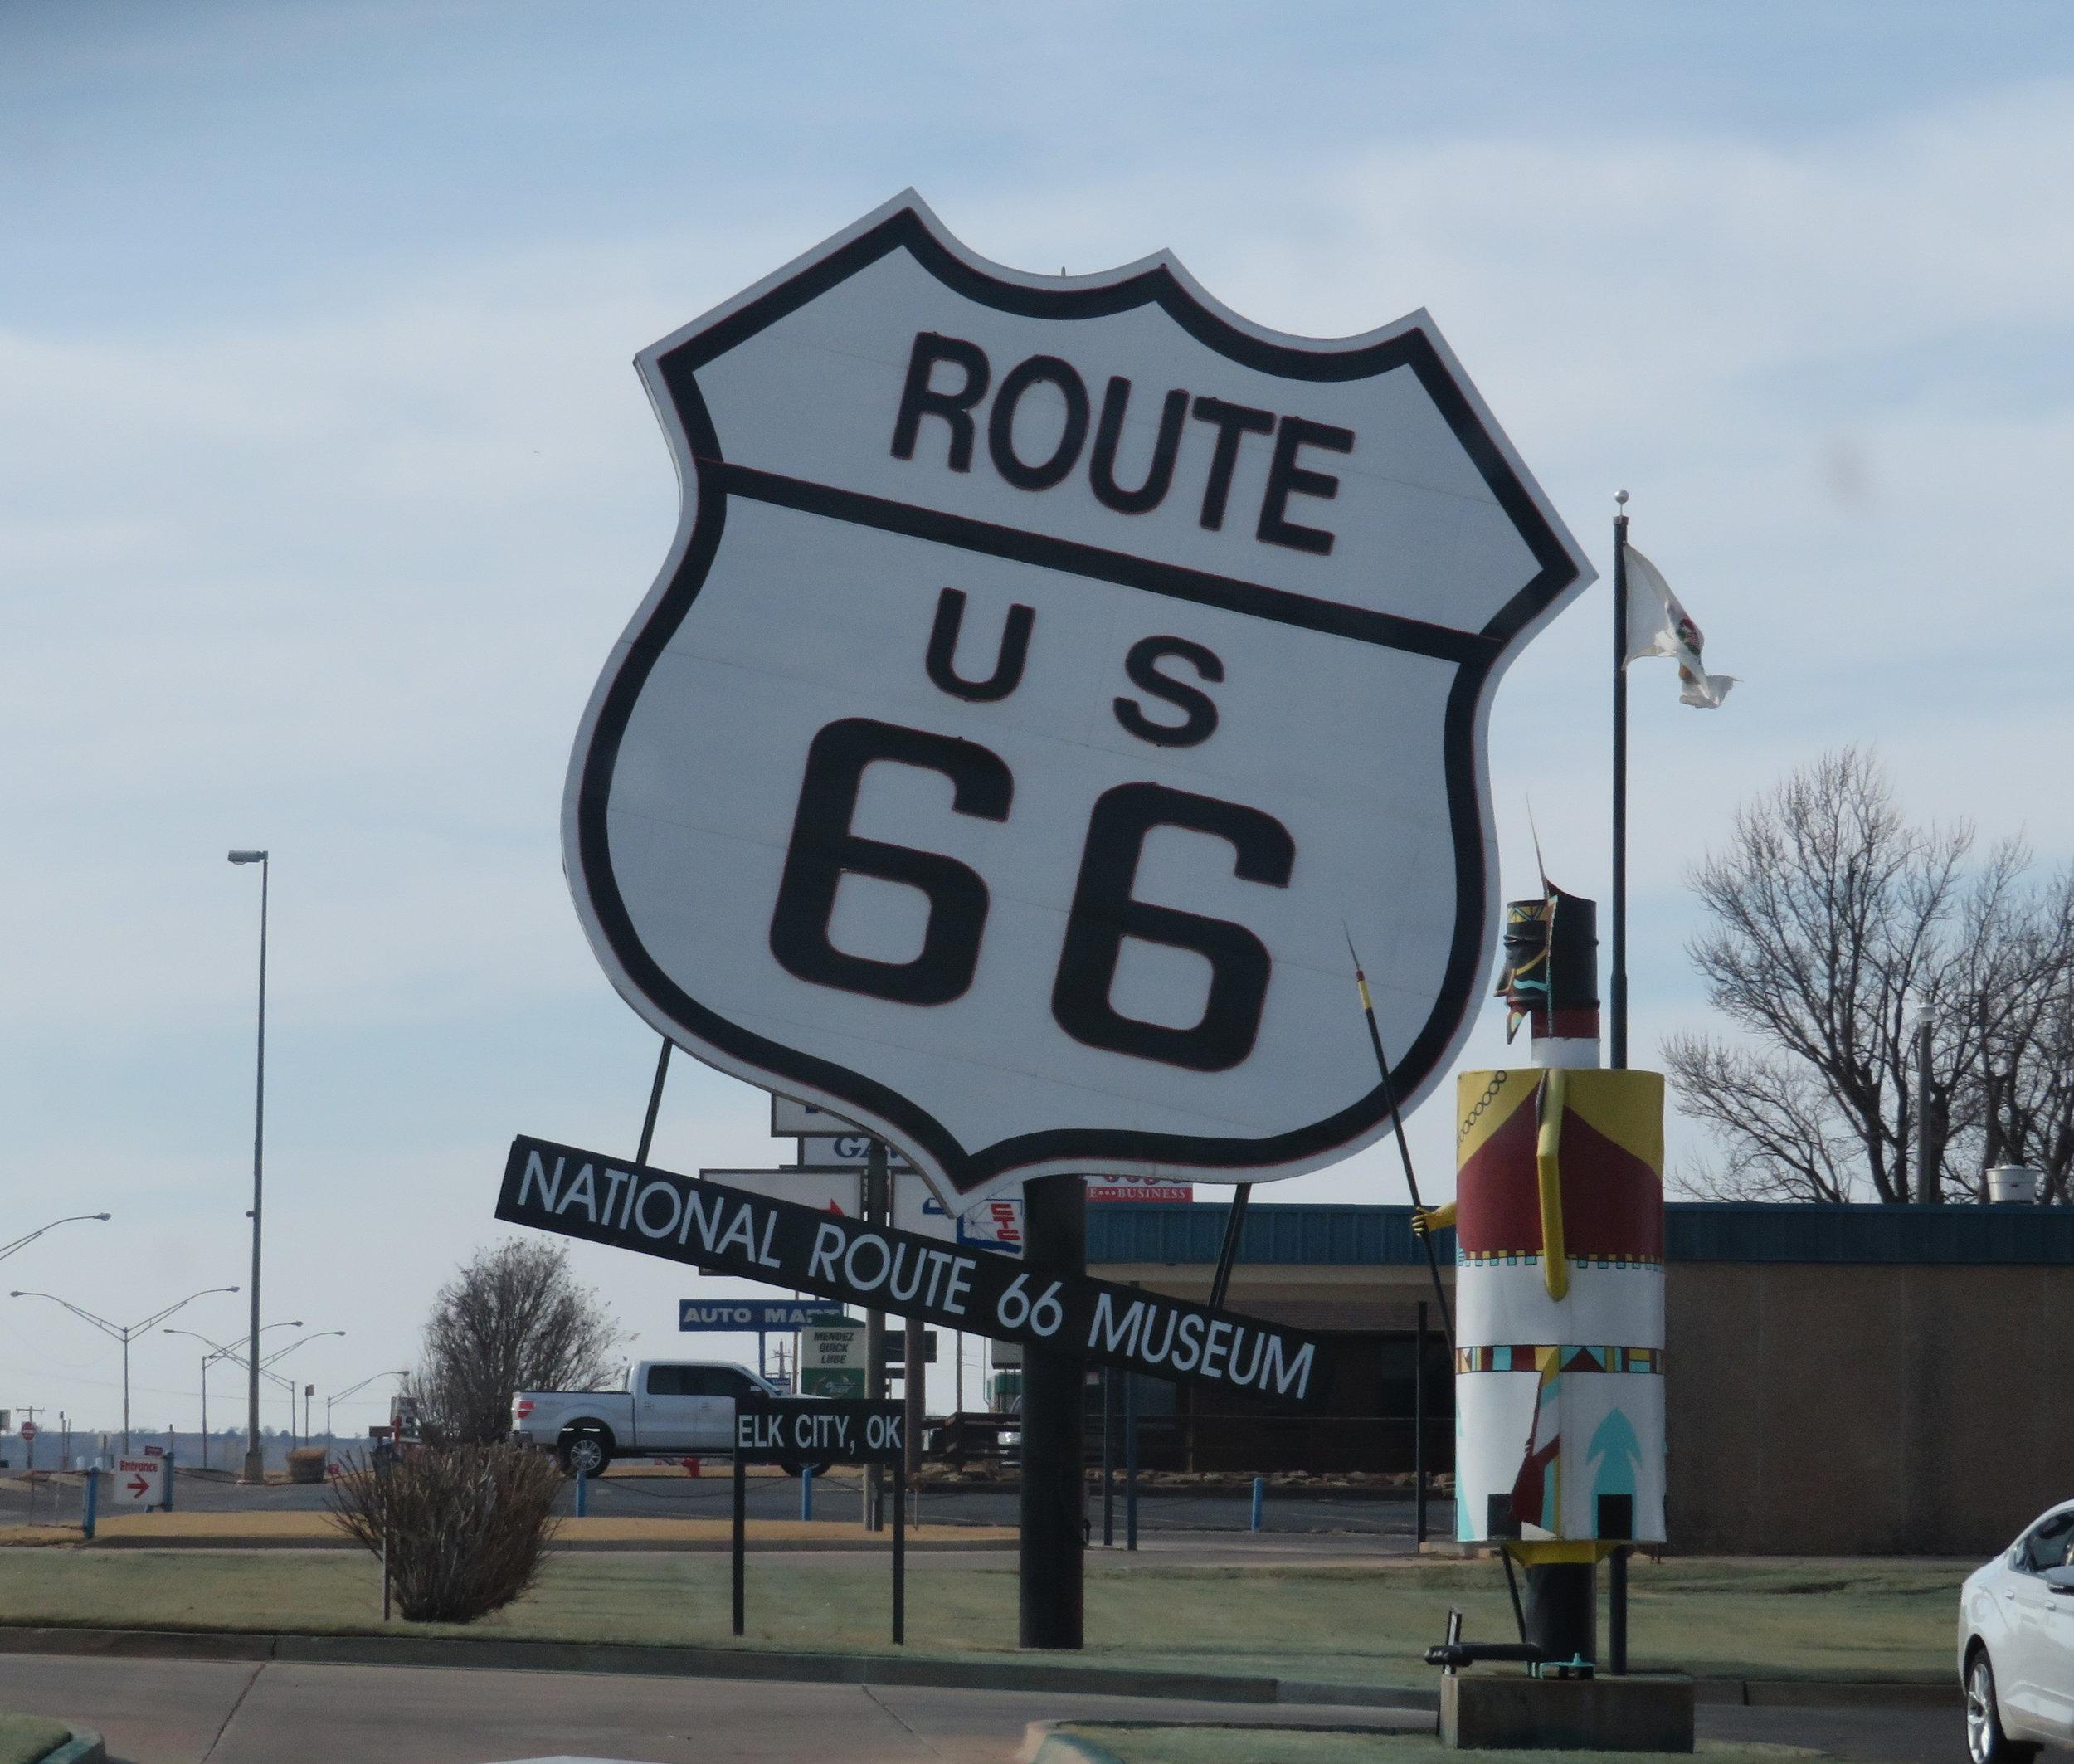 worlds largest rte 66 sign-elk city OK.JPG